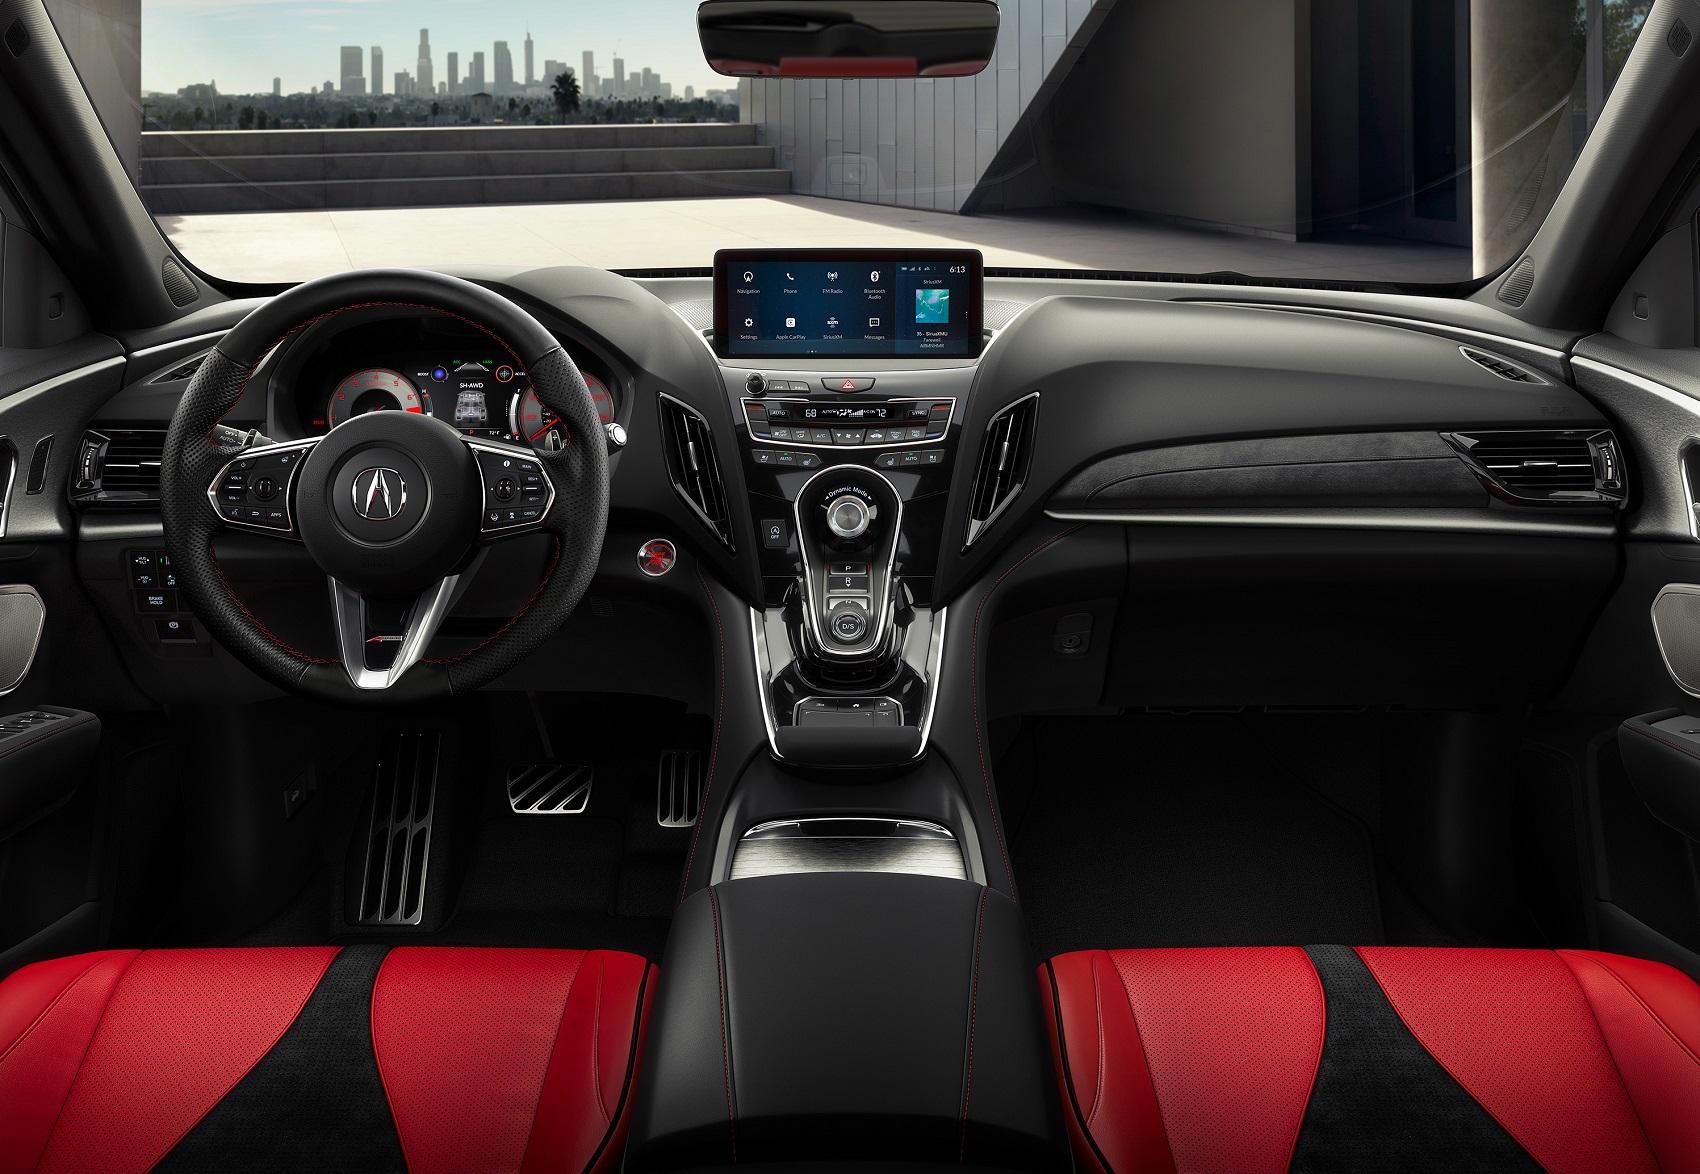 2019 Acura RDX Interior